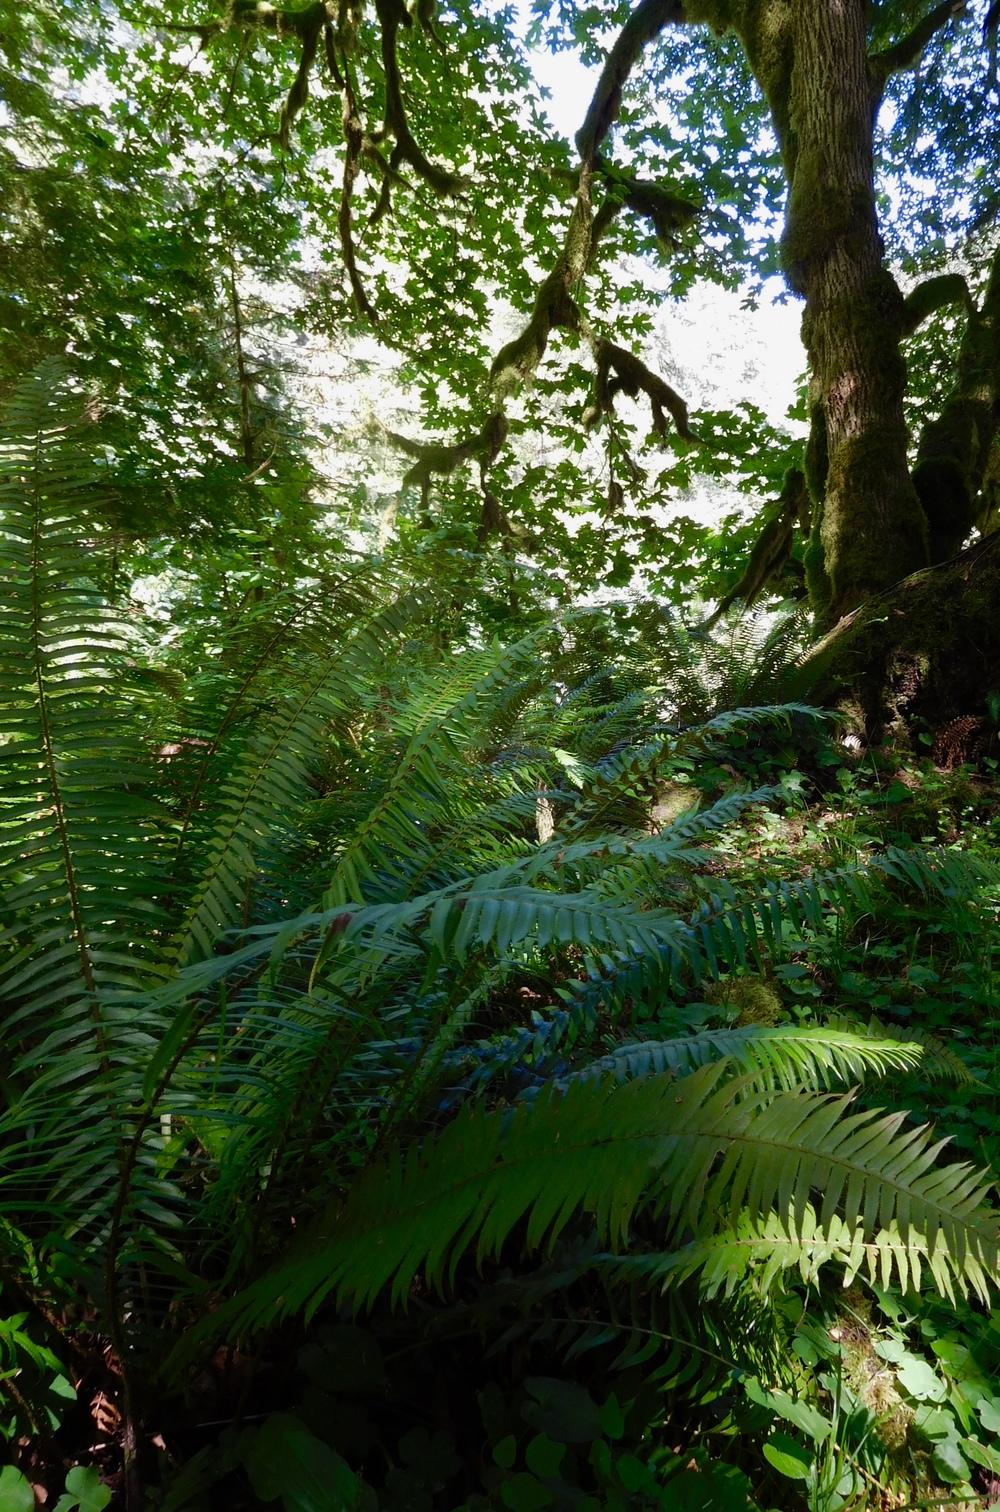 TreeSong Nature Awareness and Retreat Center  https://treesongnatureawareness.org/